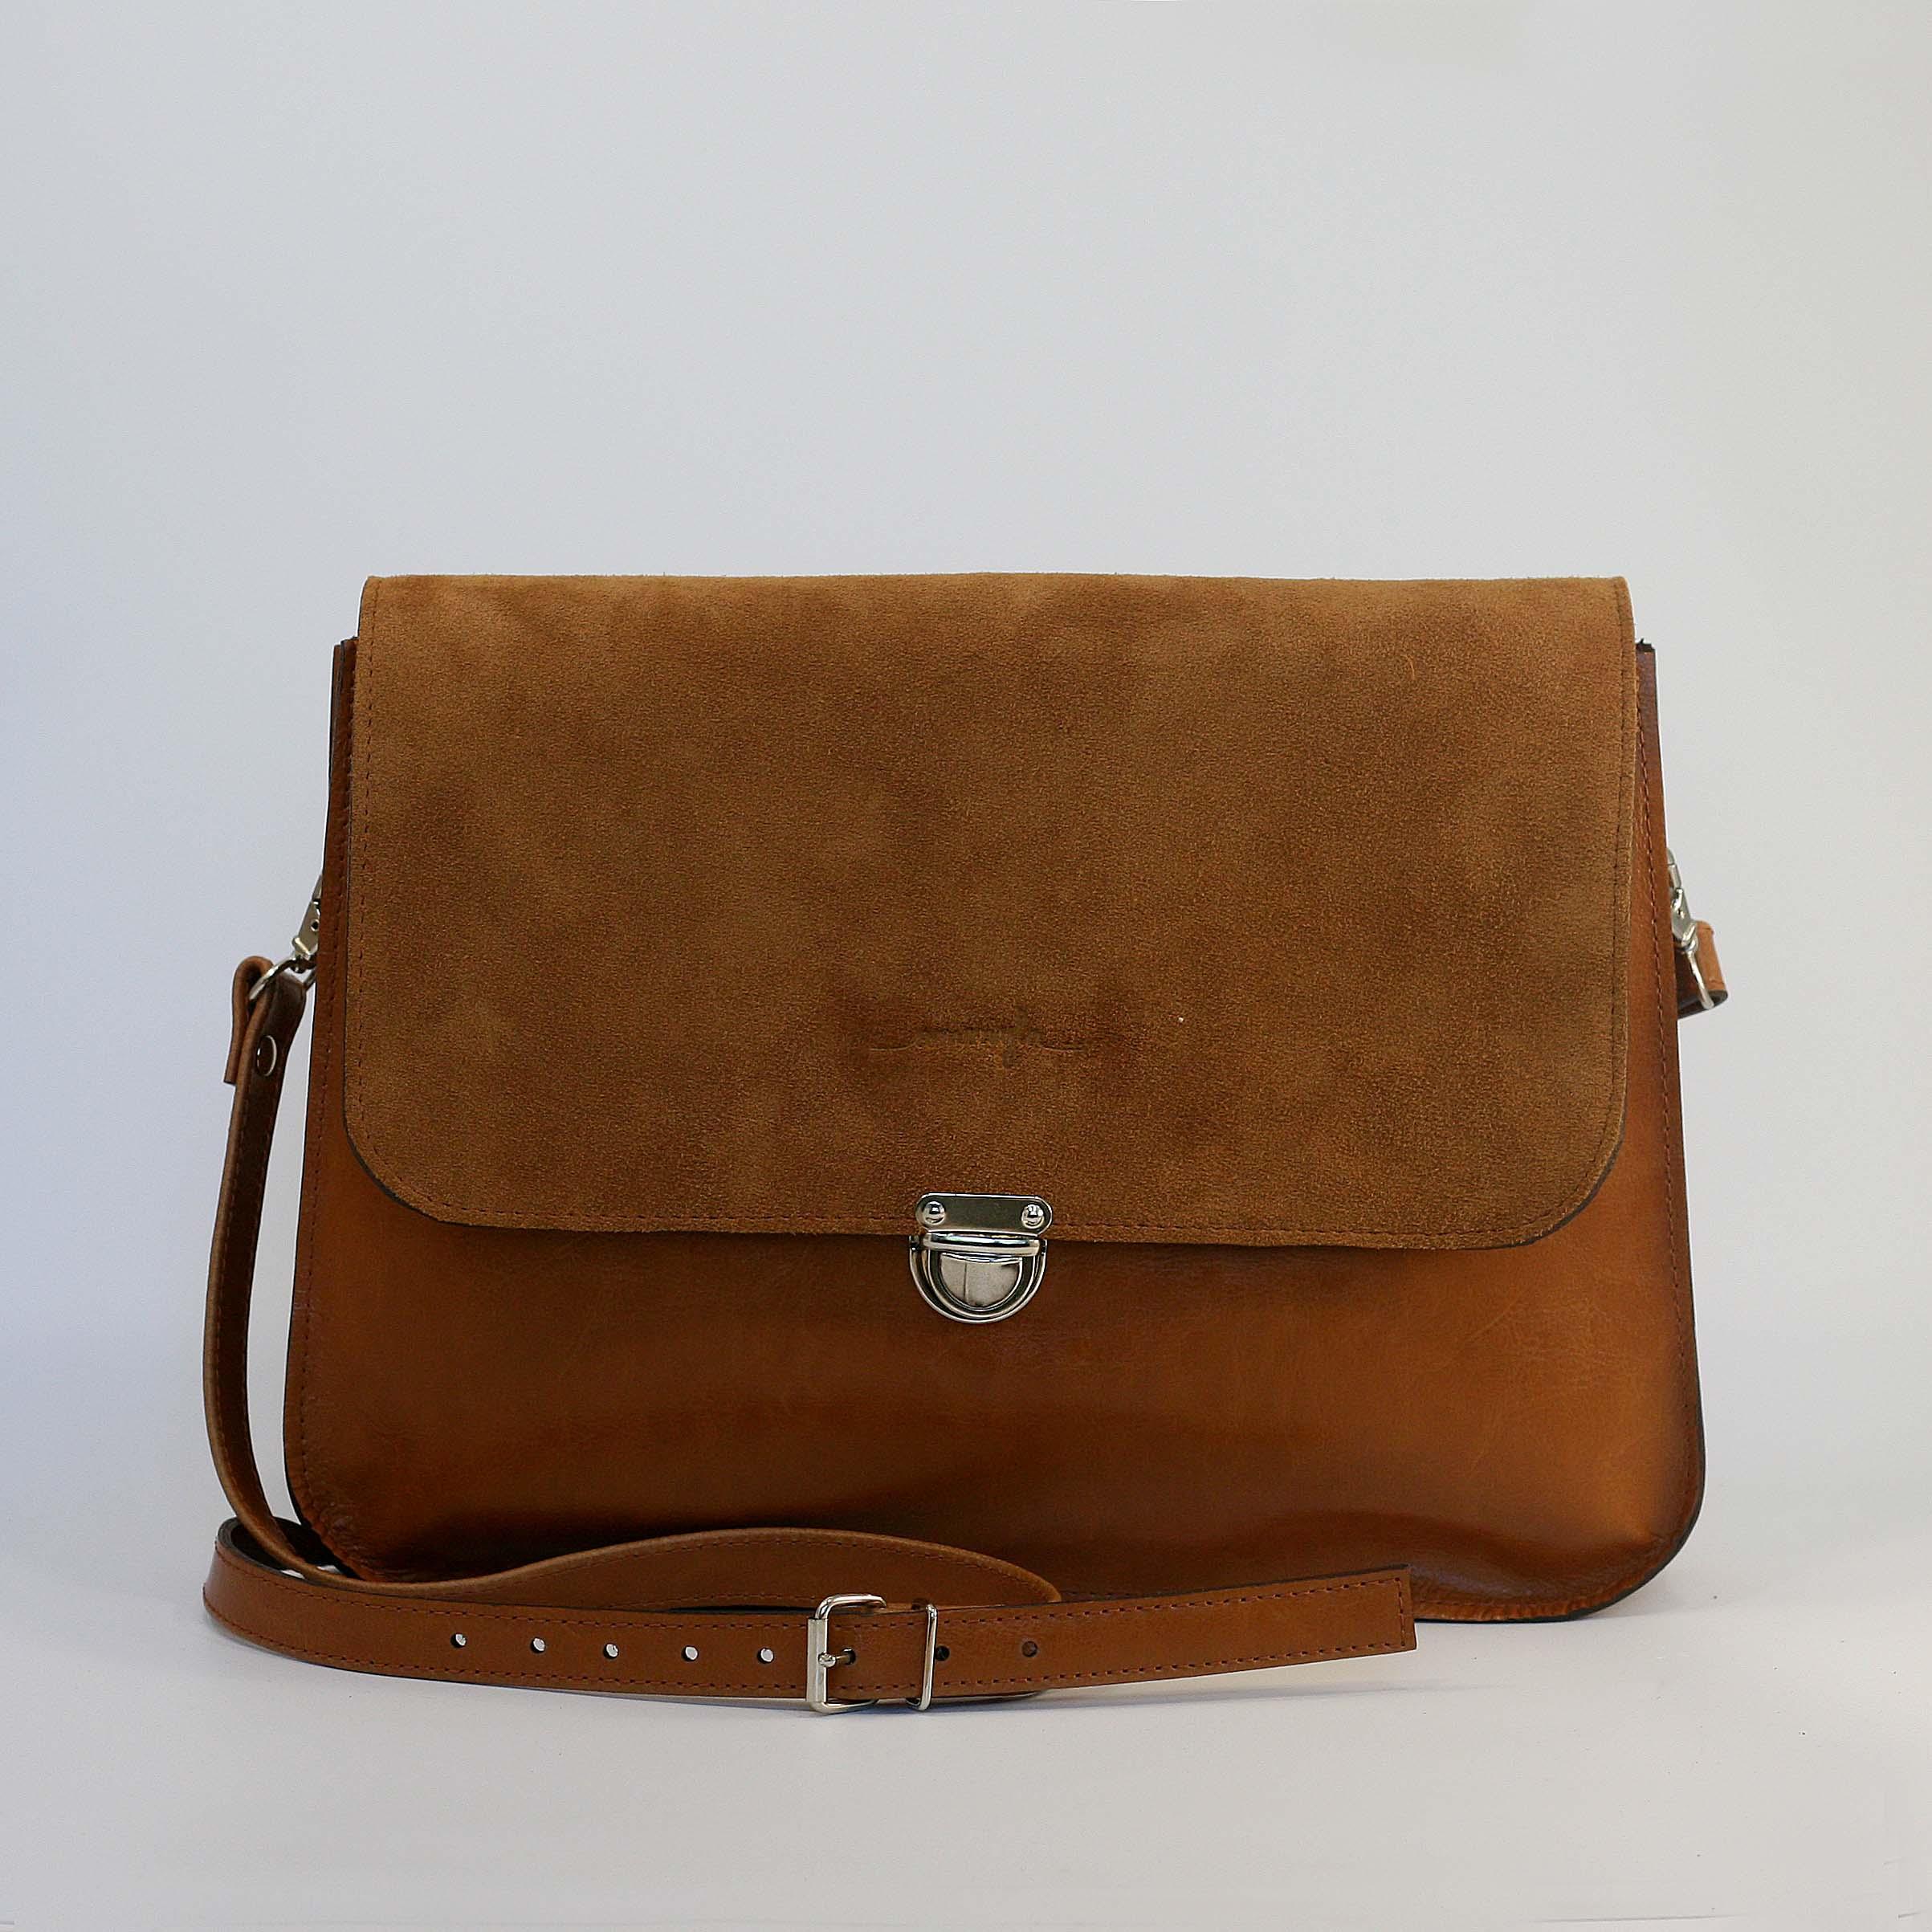 Kožená kabelka Vanessa (koňaková hnedá) 2c8c811a6fa